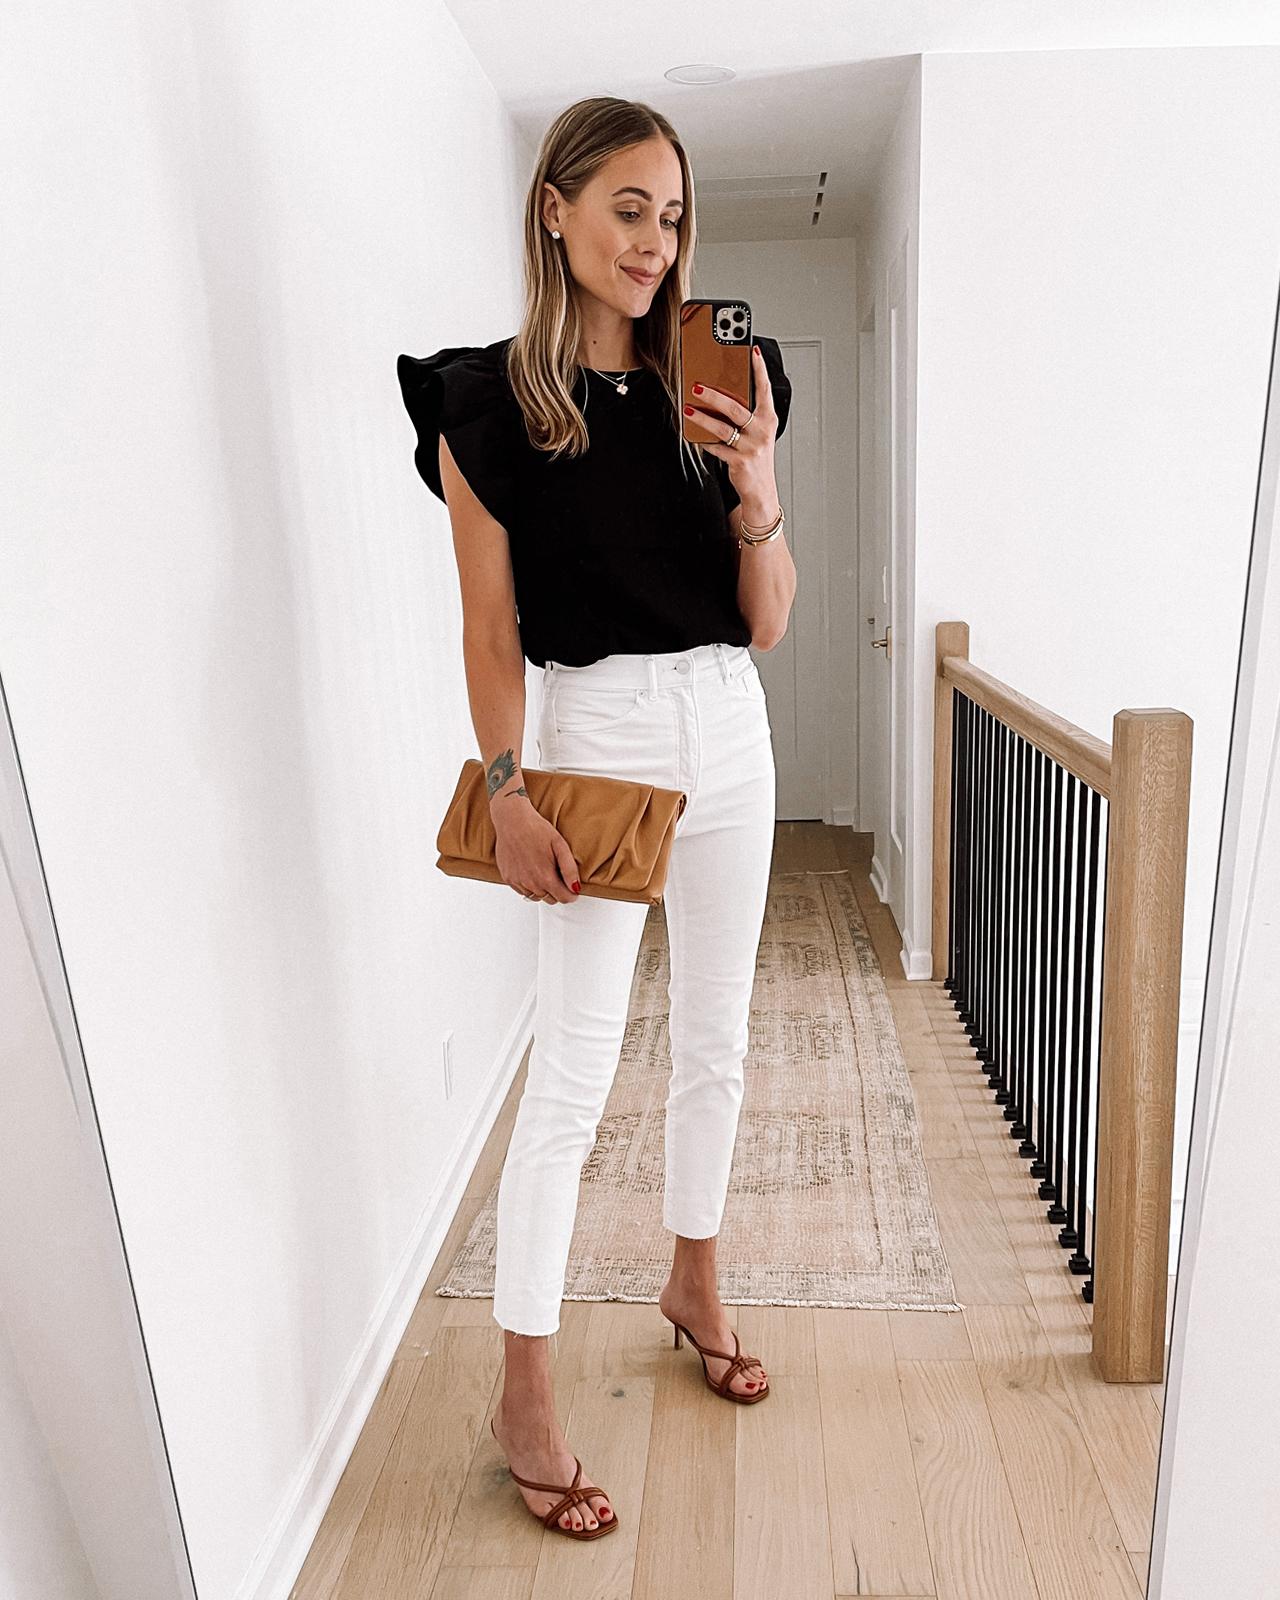 Fashion Jackson Wearing Black Flutter Sleeve Bodysuit White Skinny Jeans Tan Sandals Tan Clutch Express Haul